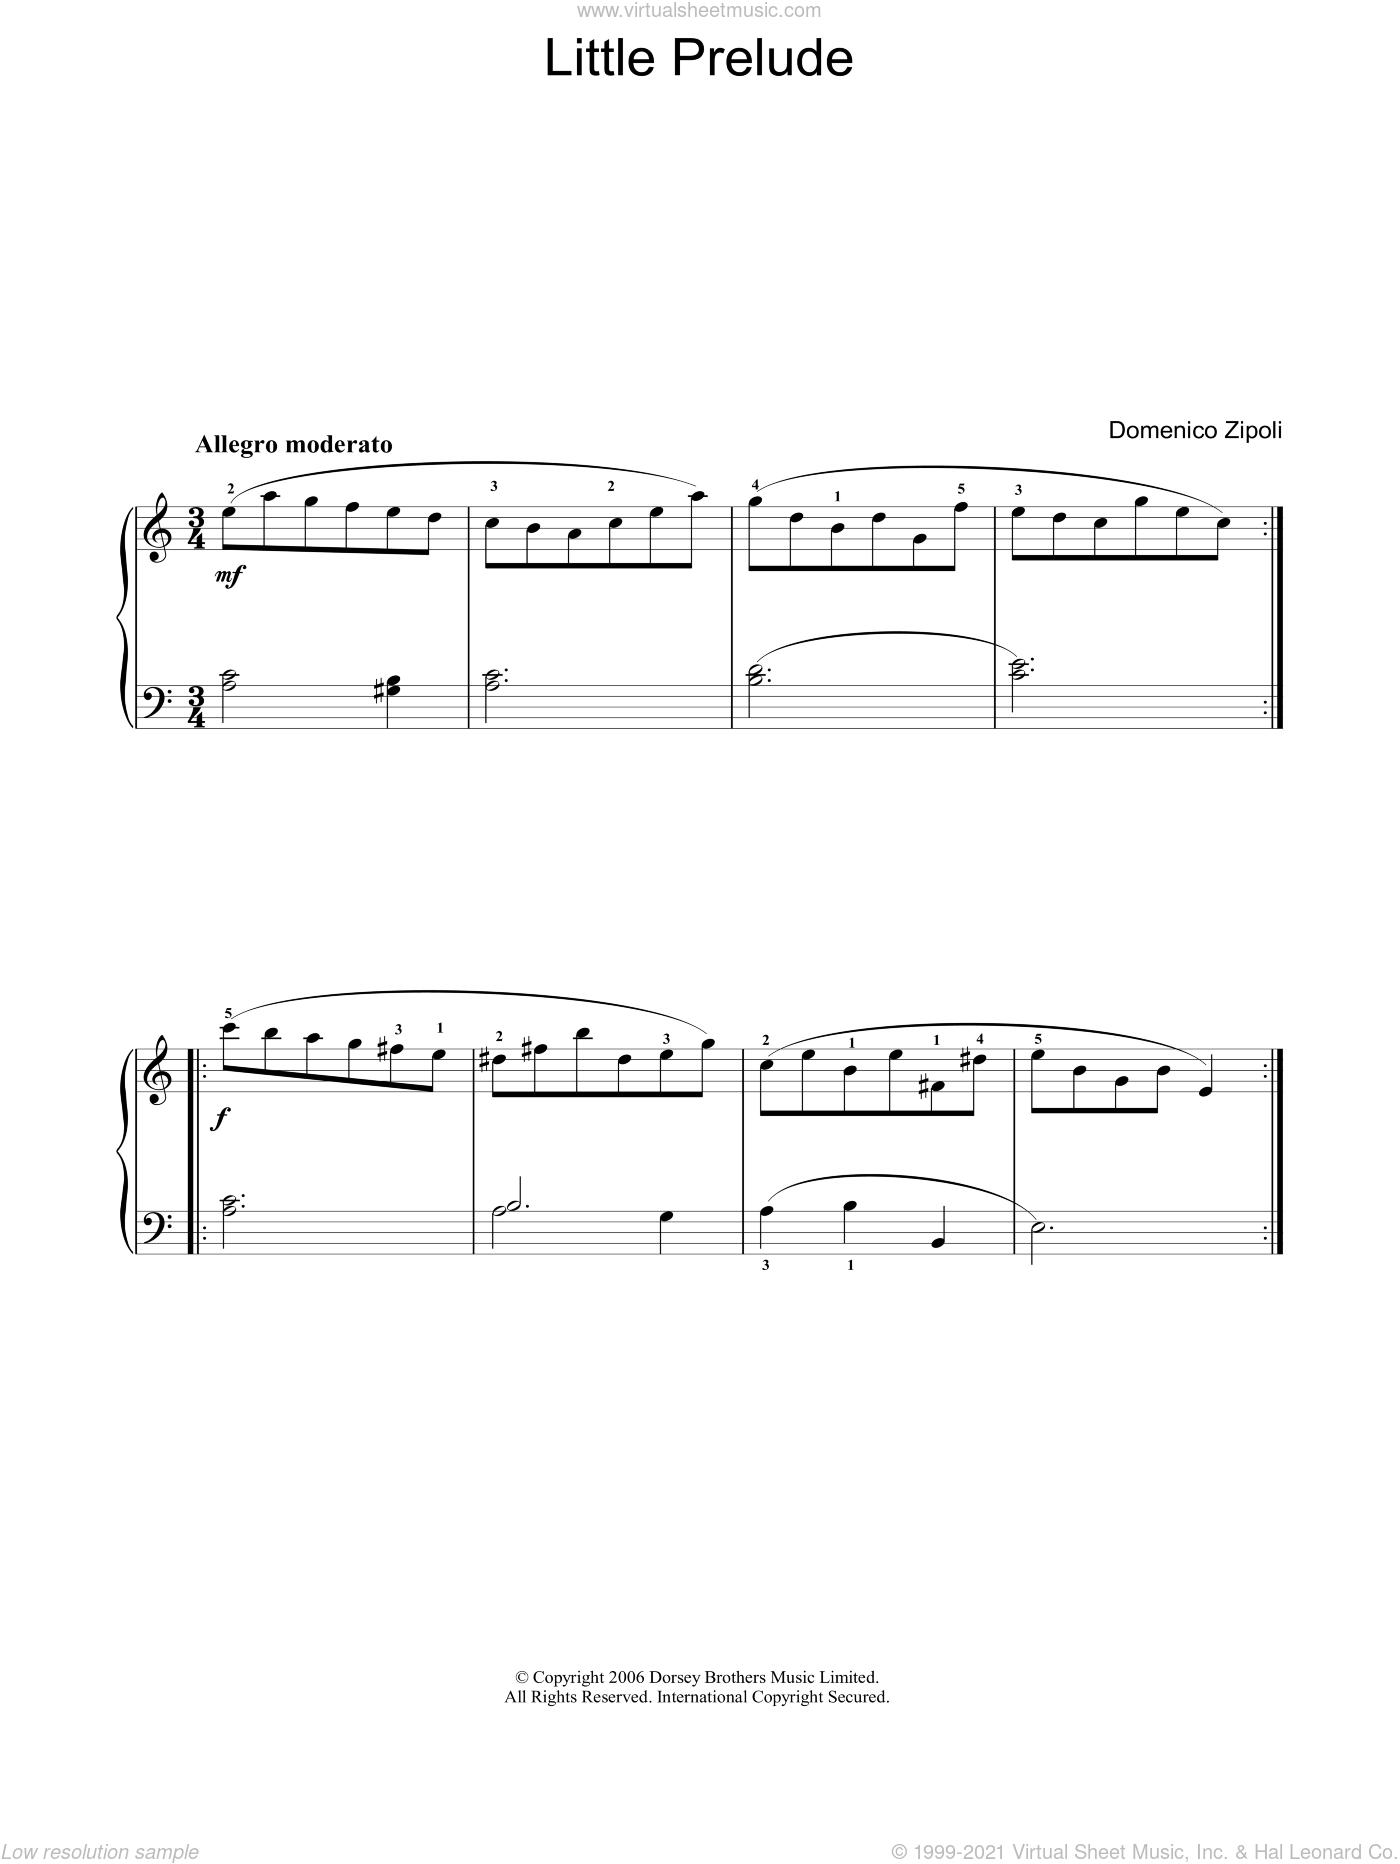 Little Prelude sheet music for voice, piano or guitar by Domenico Zipoli, classical score, intermediate skill level